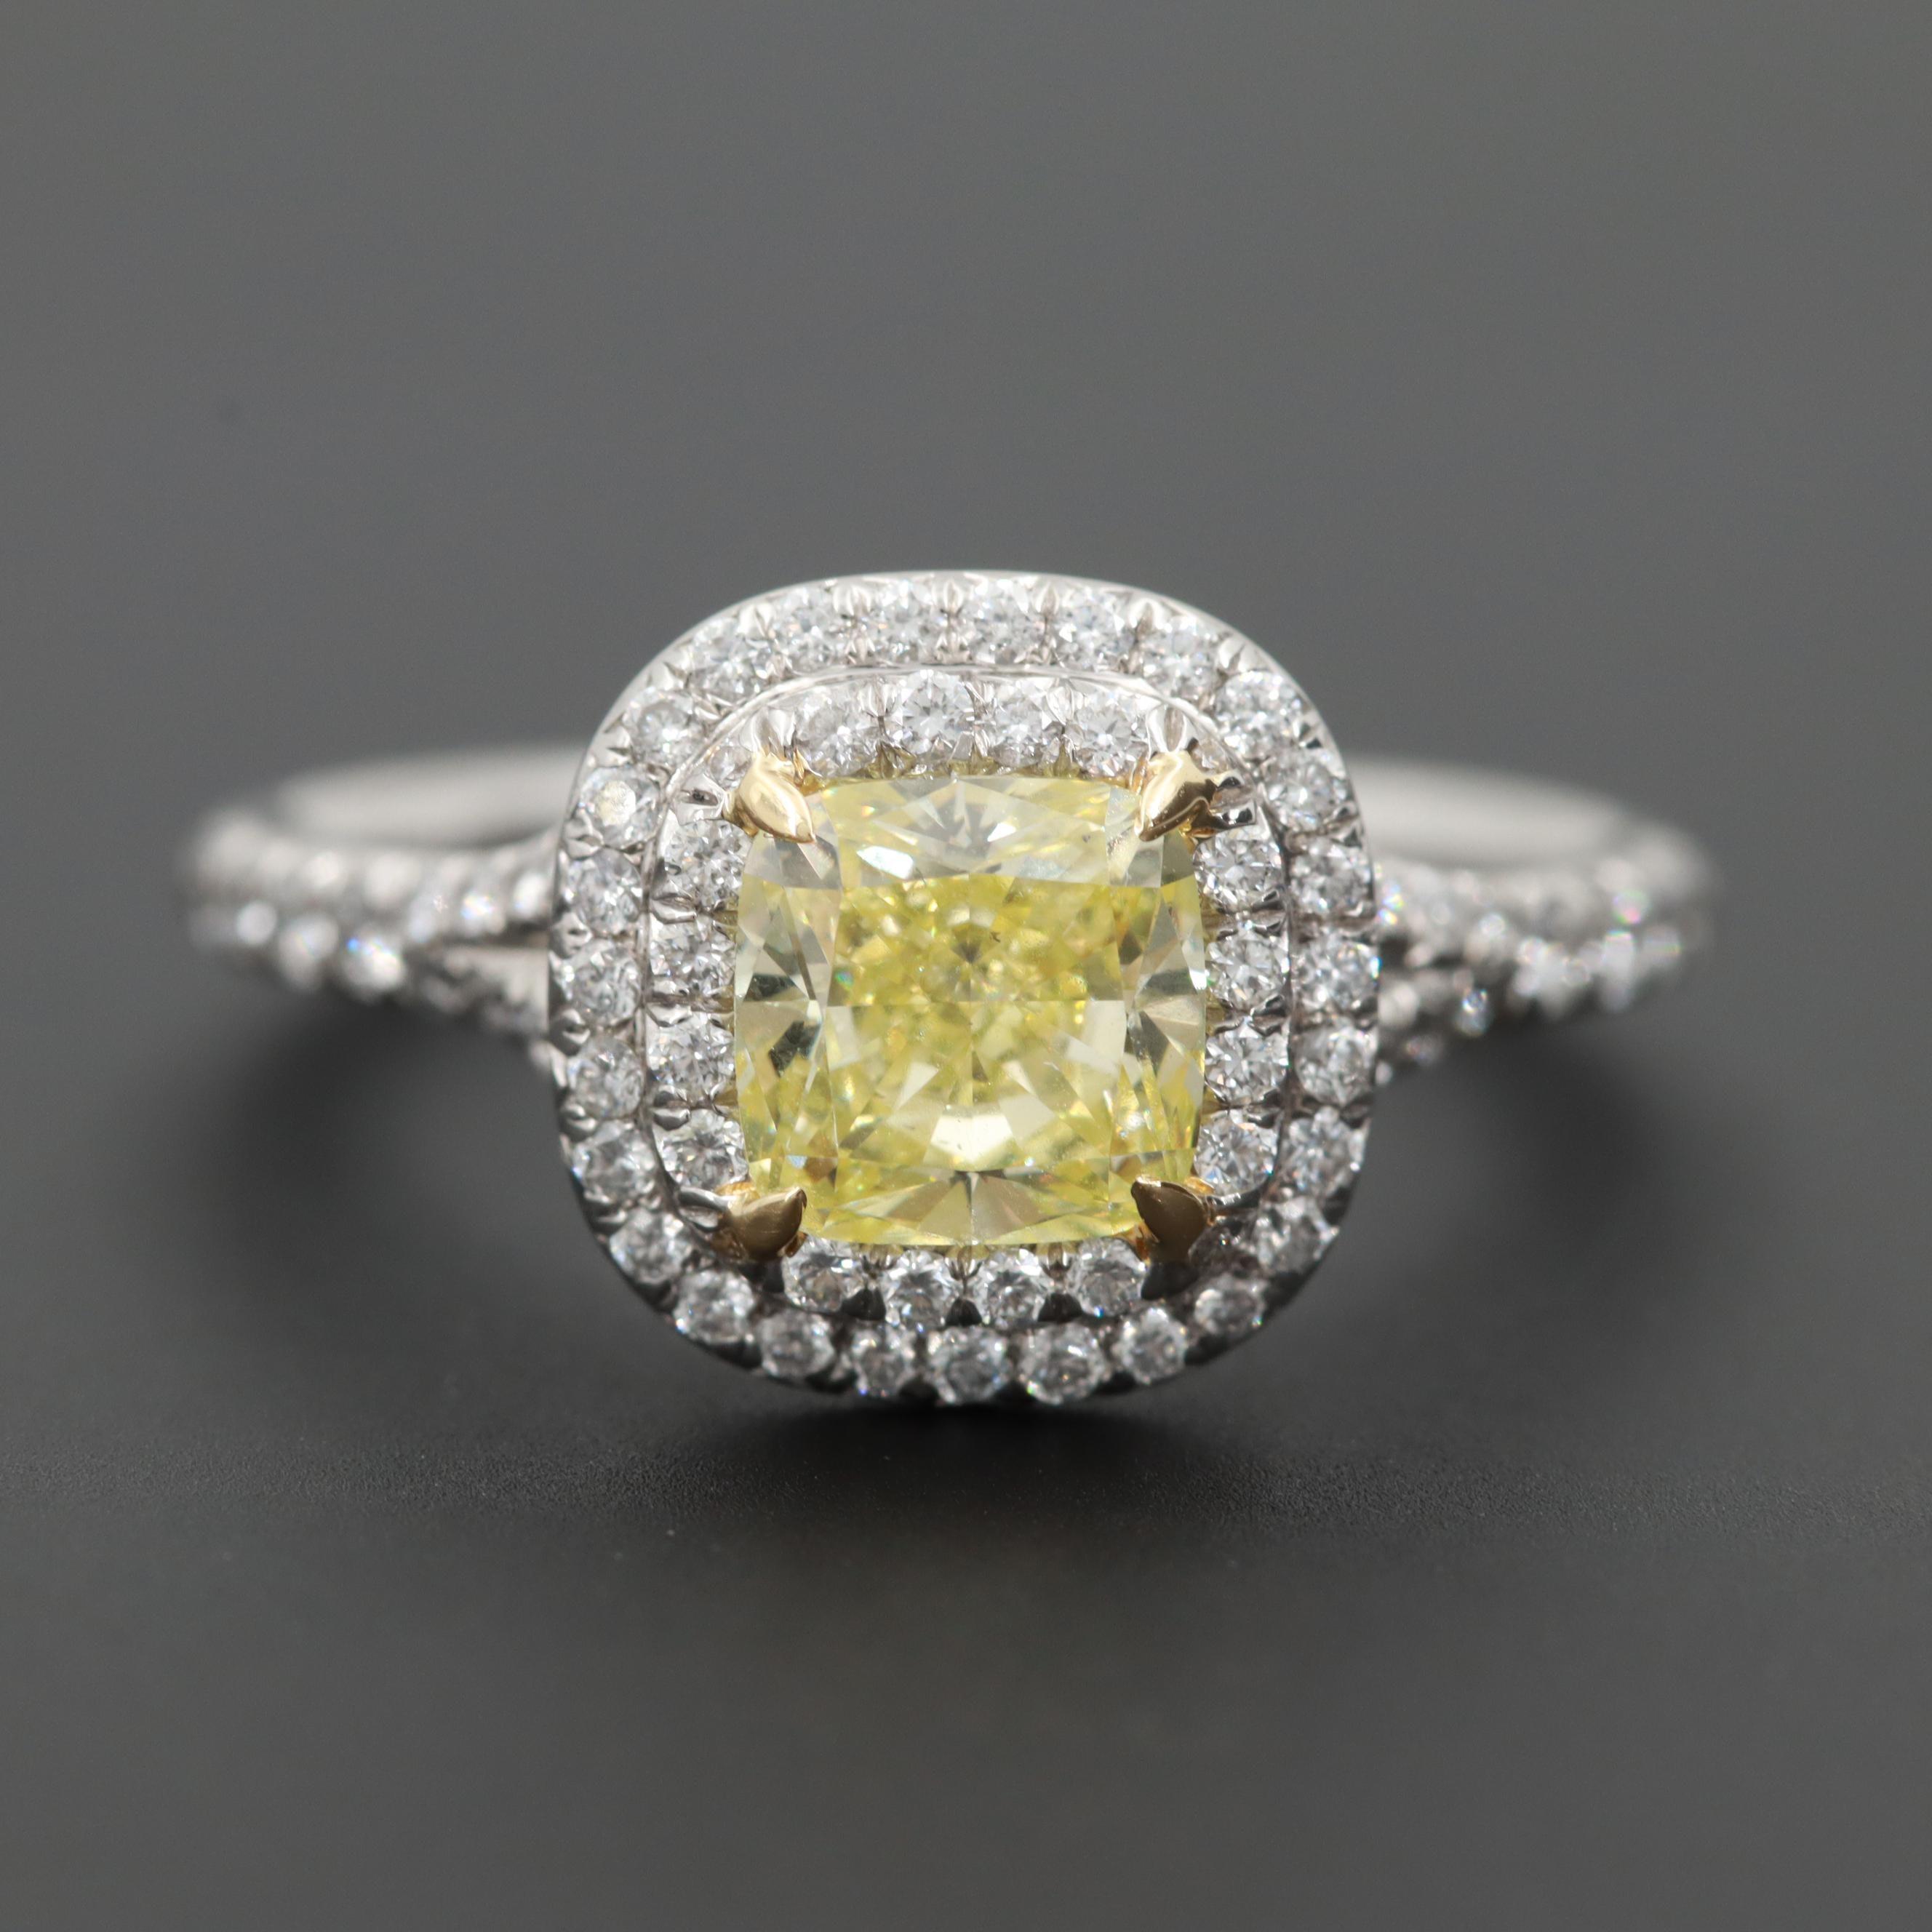 Tiffany & Co. Platinum 1.46 CTW Diamond Ring with Fancy Intense Yellow Diamond